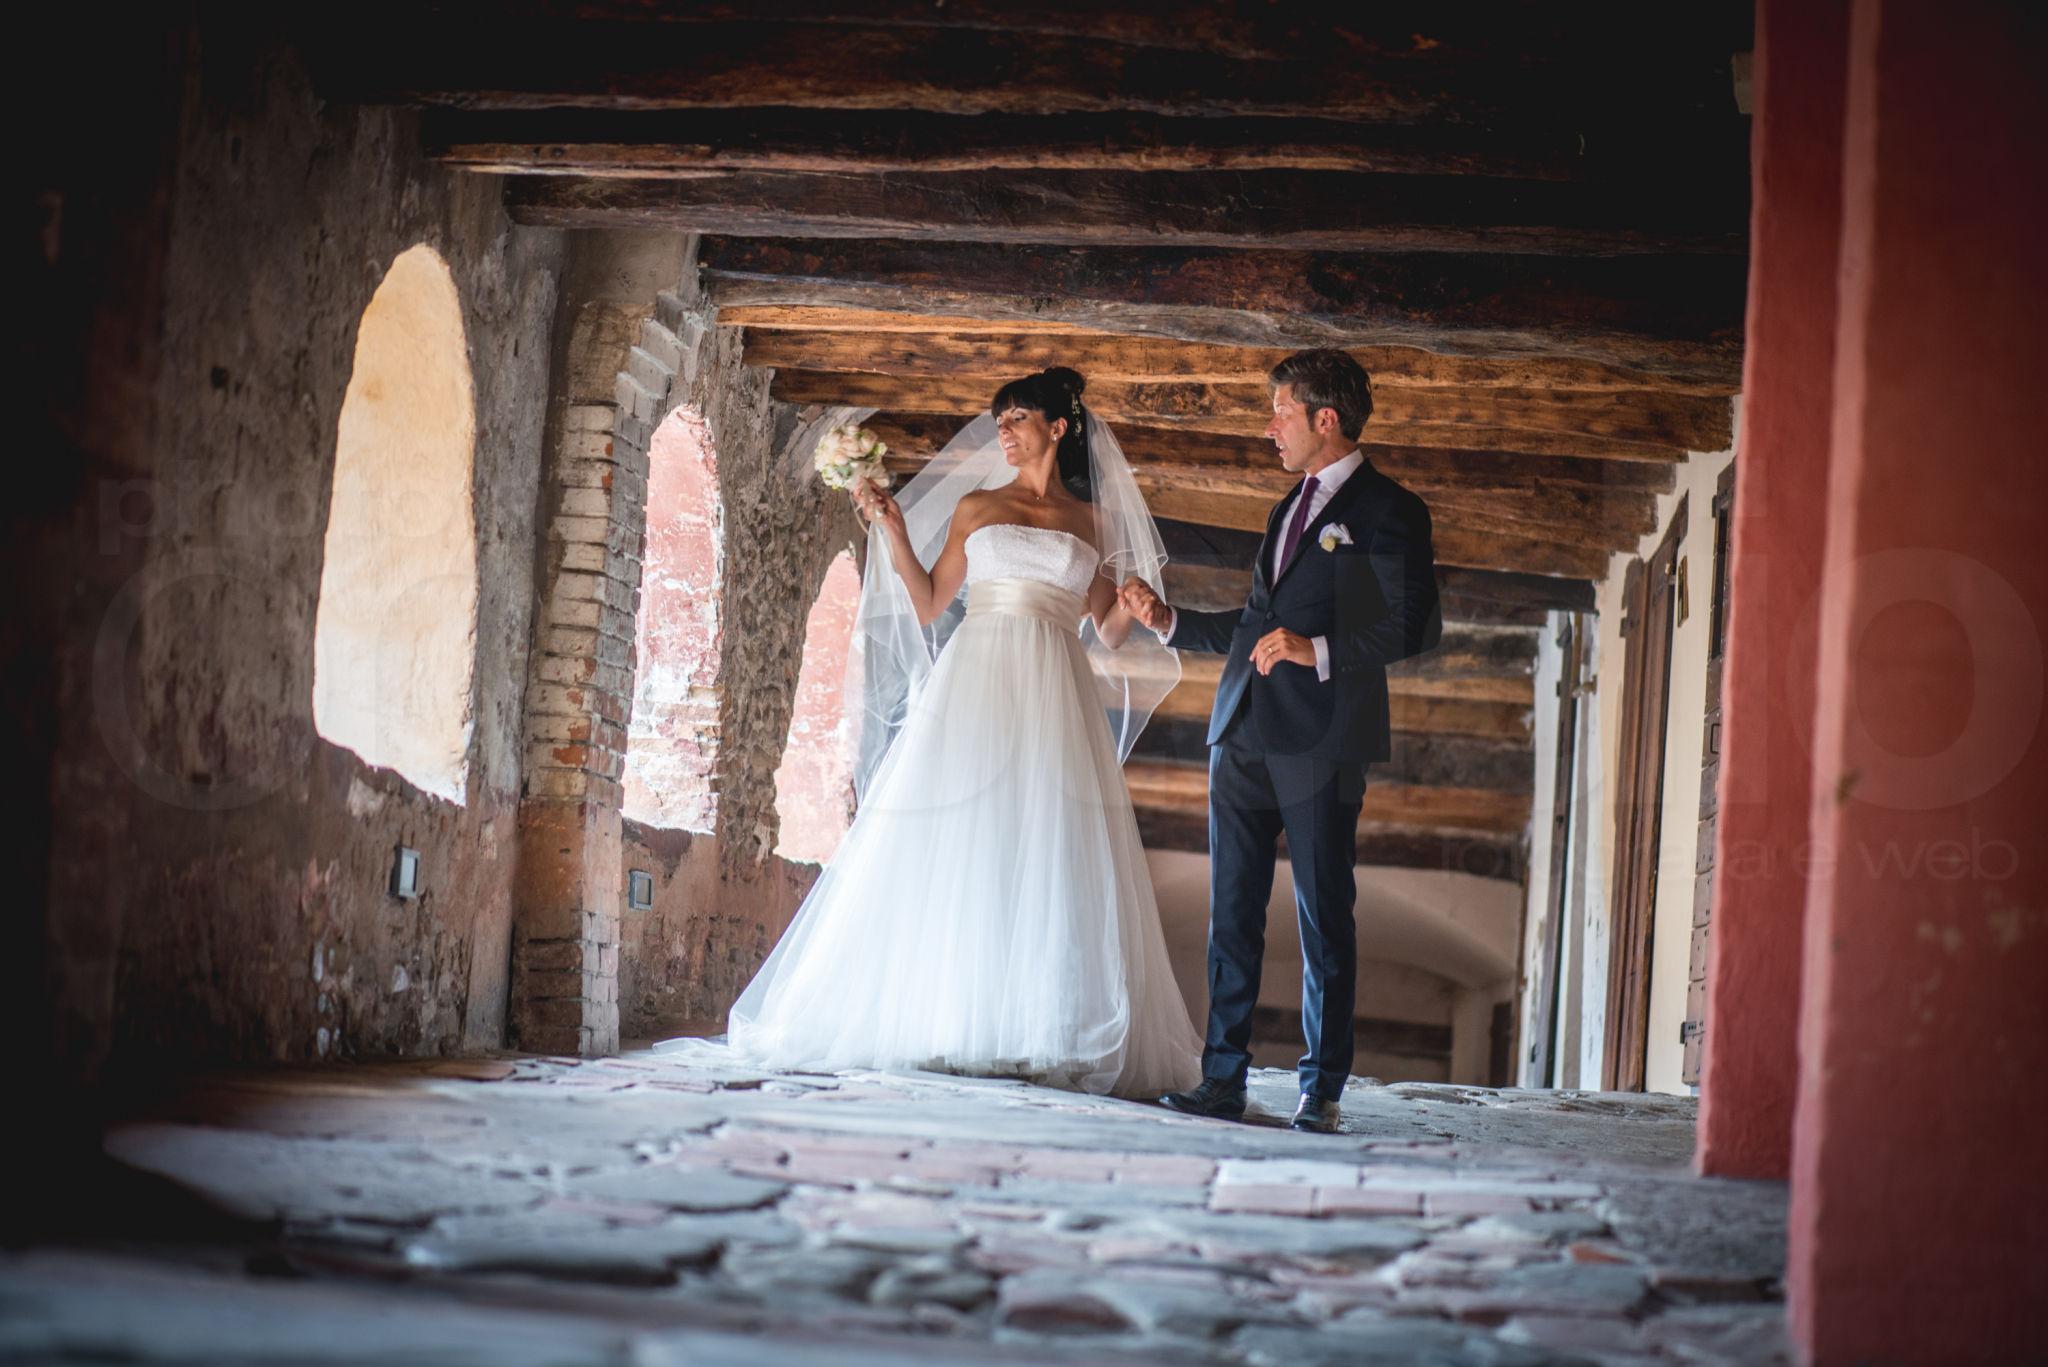 http://lnx.mirkone.it/wp-content/uploads/2015/07/fotografo-matrimoni-faenza-0019.jpg